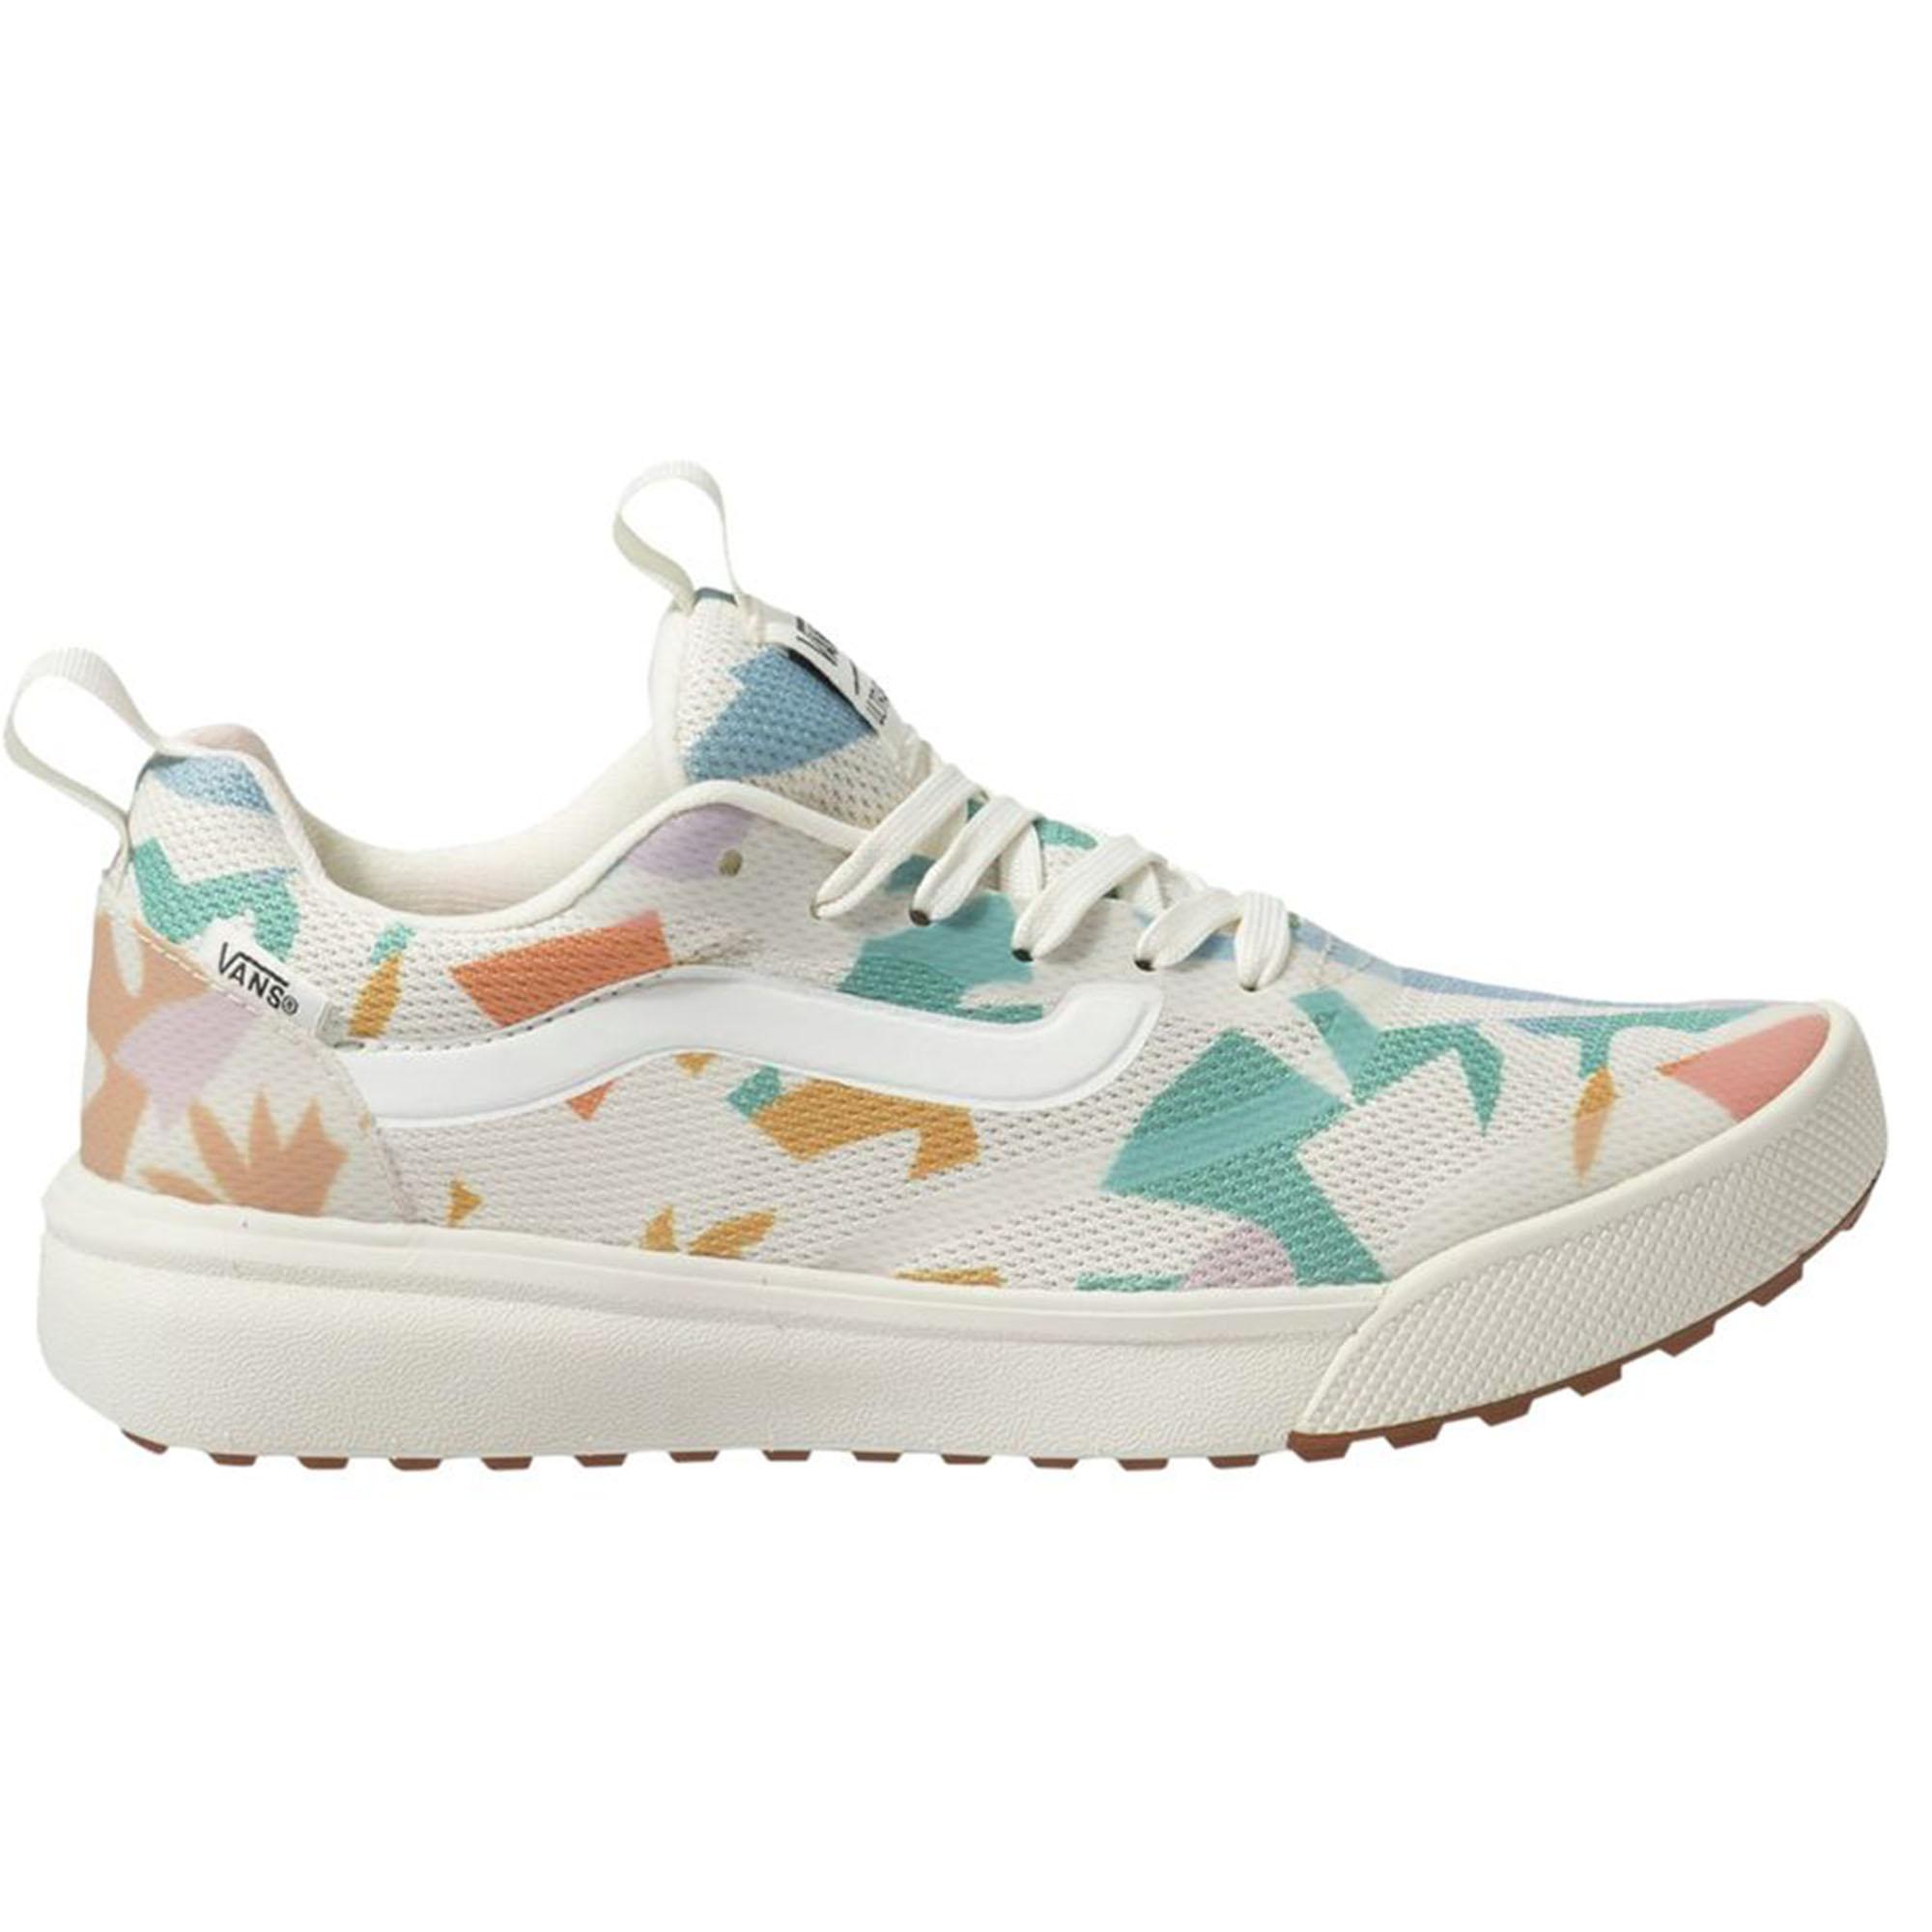 Vans Women's Ultrarange Rapidweld Casual Shoes Abstract